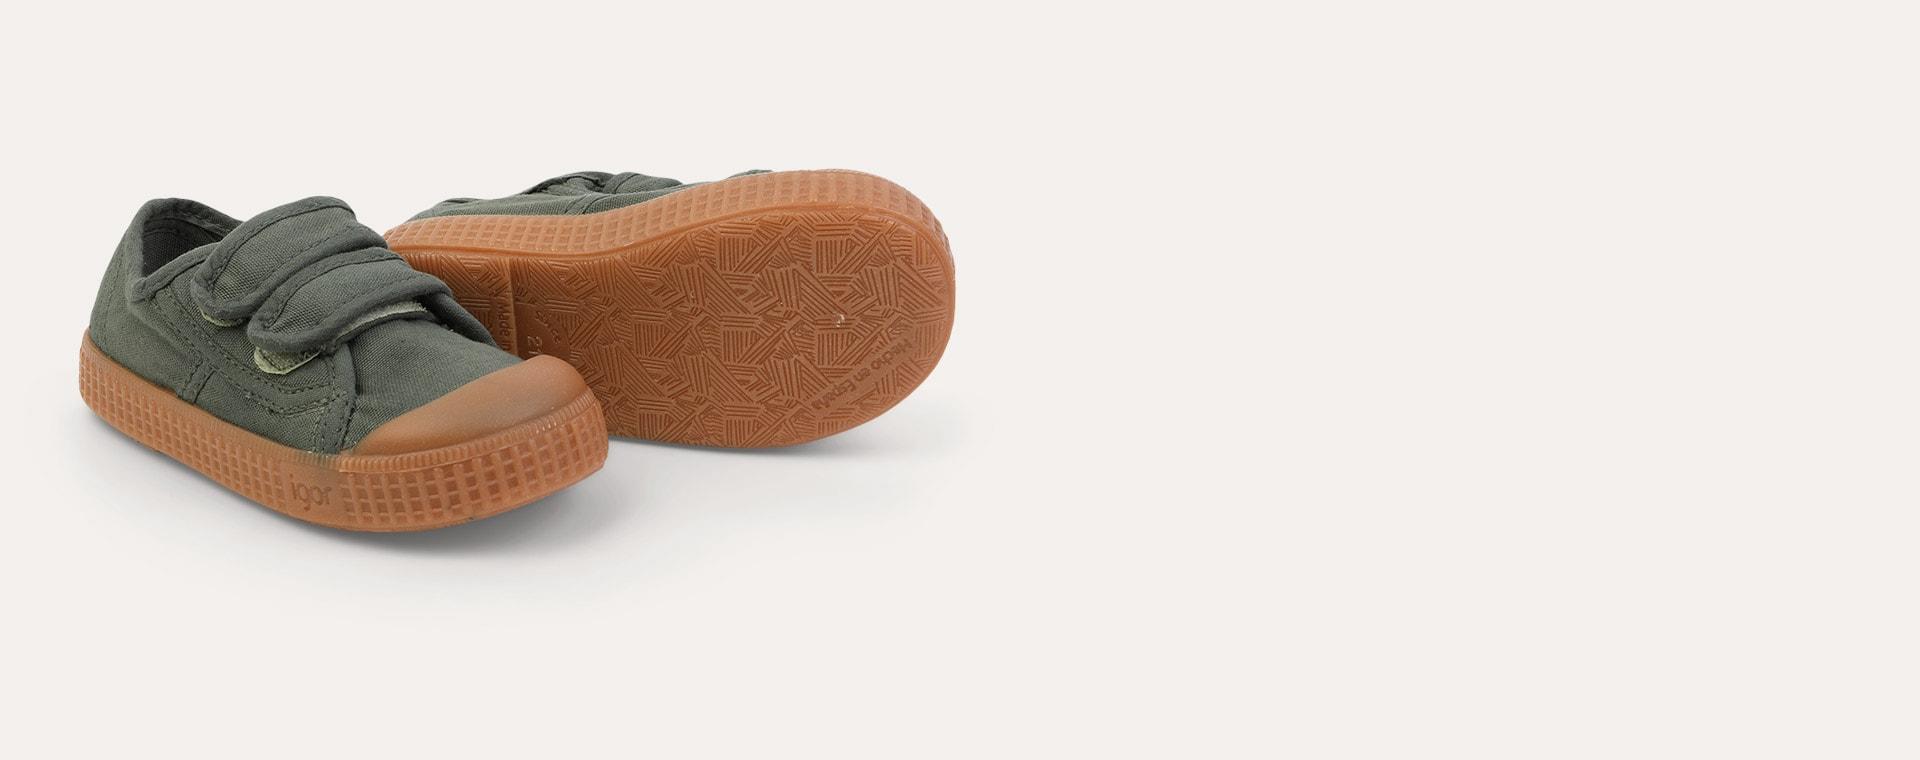 Kaki igor Berri Velcro Caramelo